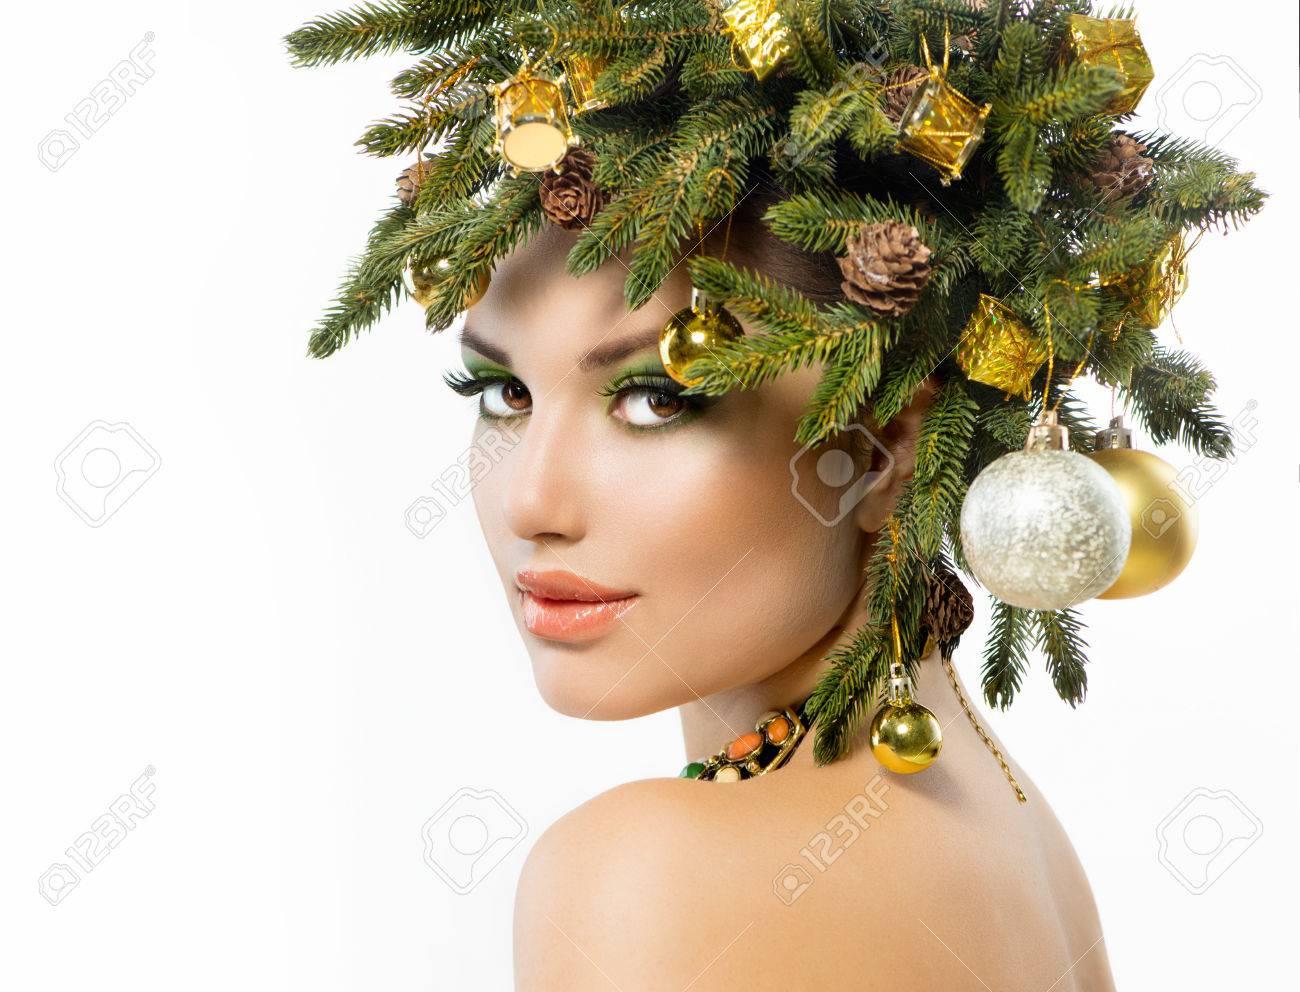 Christmas Woman  Christmas Tree Holiday Hairstyle and Make up Stock Photo - 22997371